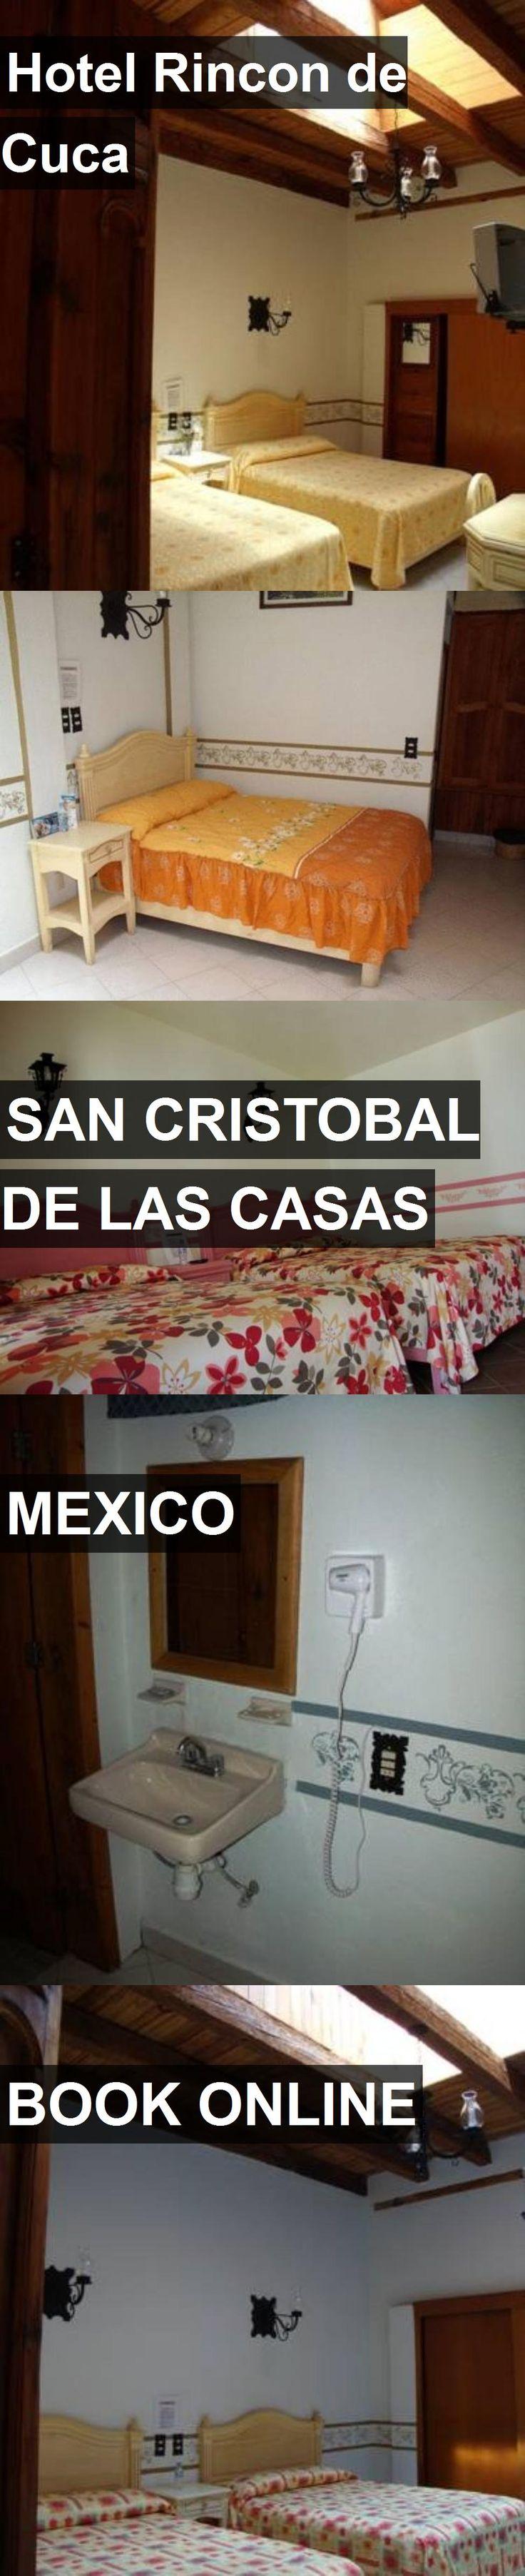 Hotel Hotel Rincon de Cuca in San Cristobal de las Casas, Mexico. For more information, photos, reviews and best prices please follow the link. #Mexico #SanCristobaldelasCasas #HotelRincondeCuca #hotel #travel #vacation